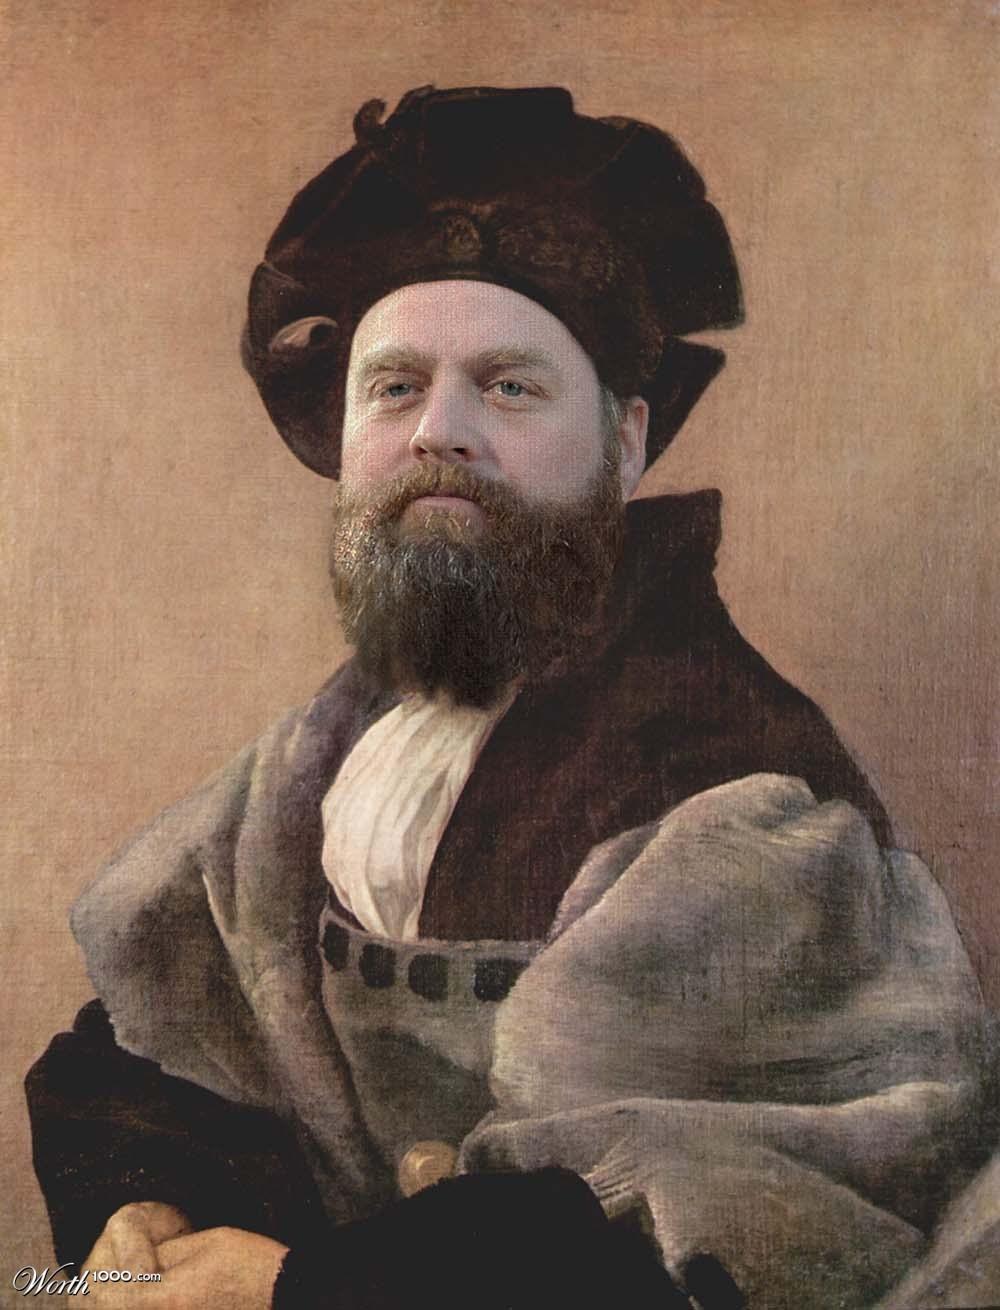 modern-renaissance-zach-galifianakis